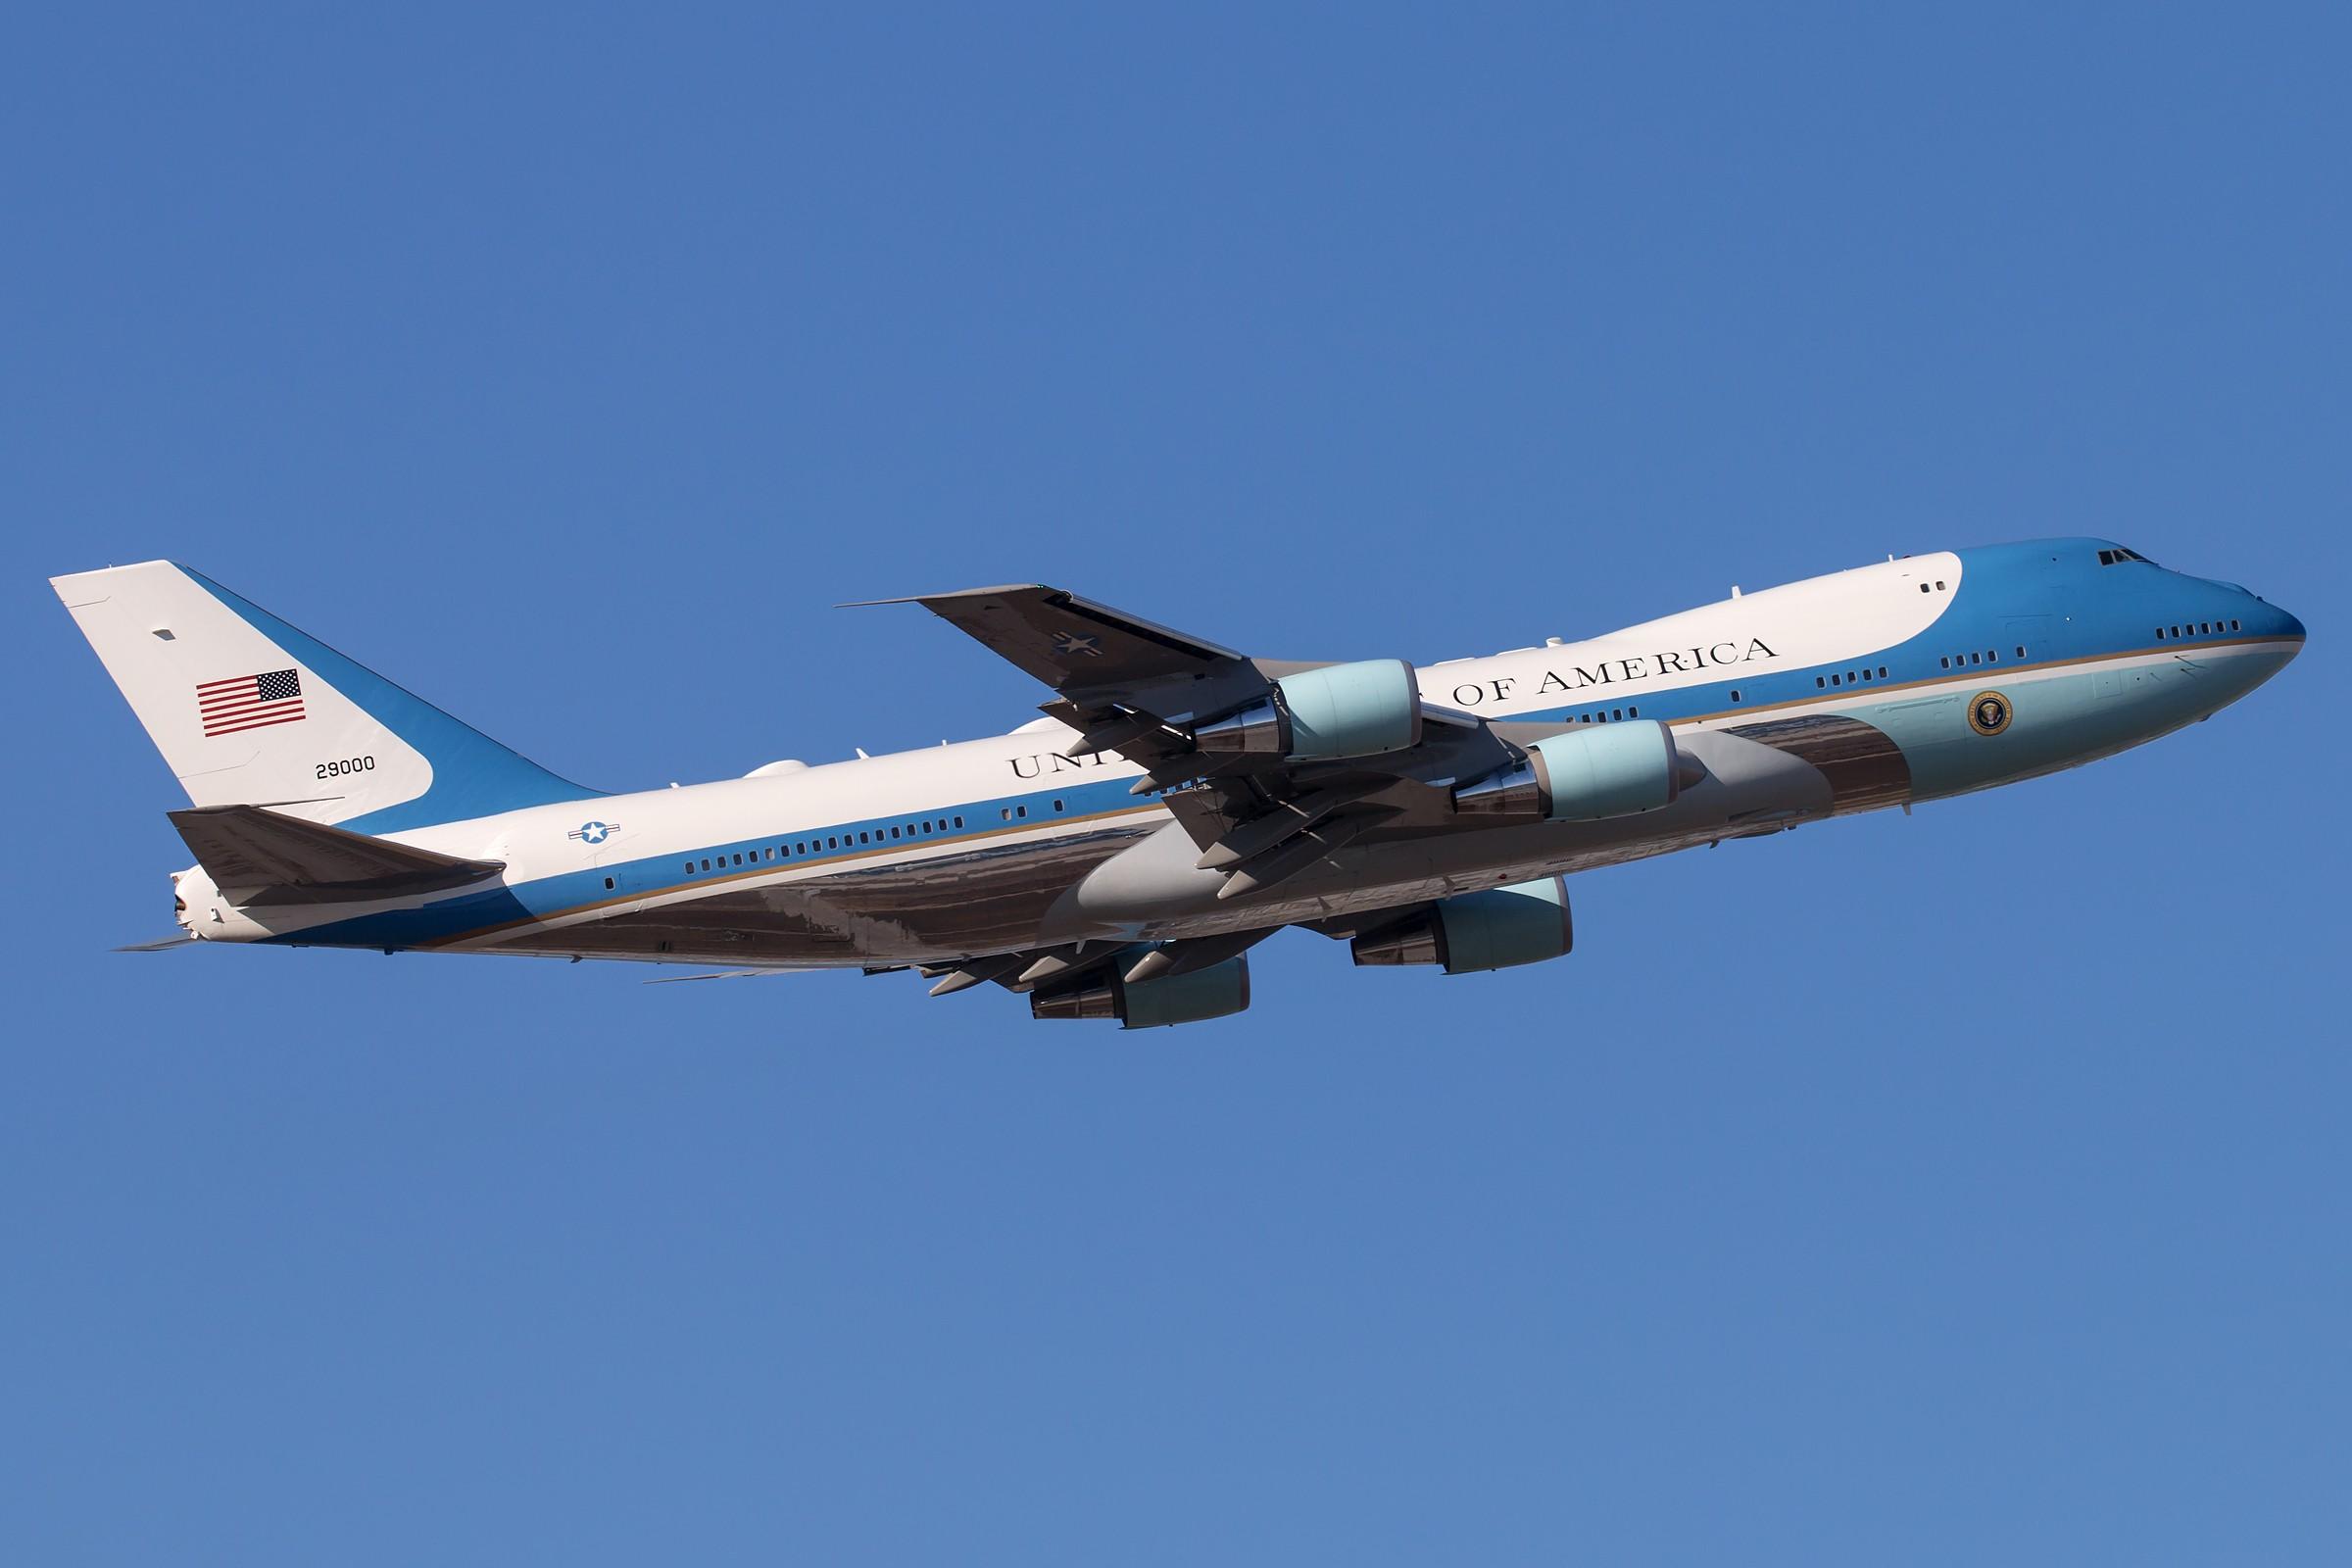 Re:[原创]82-8000、92-9000 BOEING 747-2G4B (VC-25A) 92-9000 中国北京首都国际机场